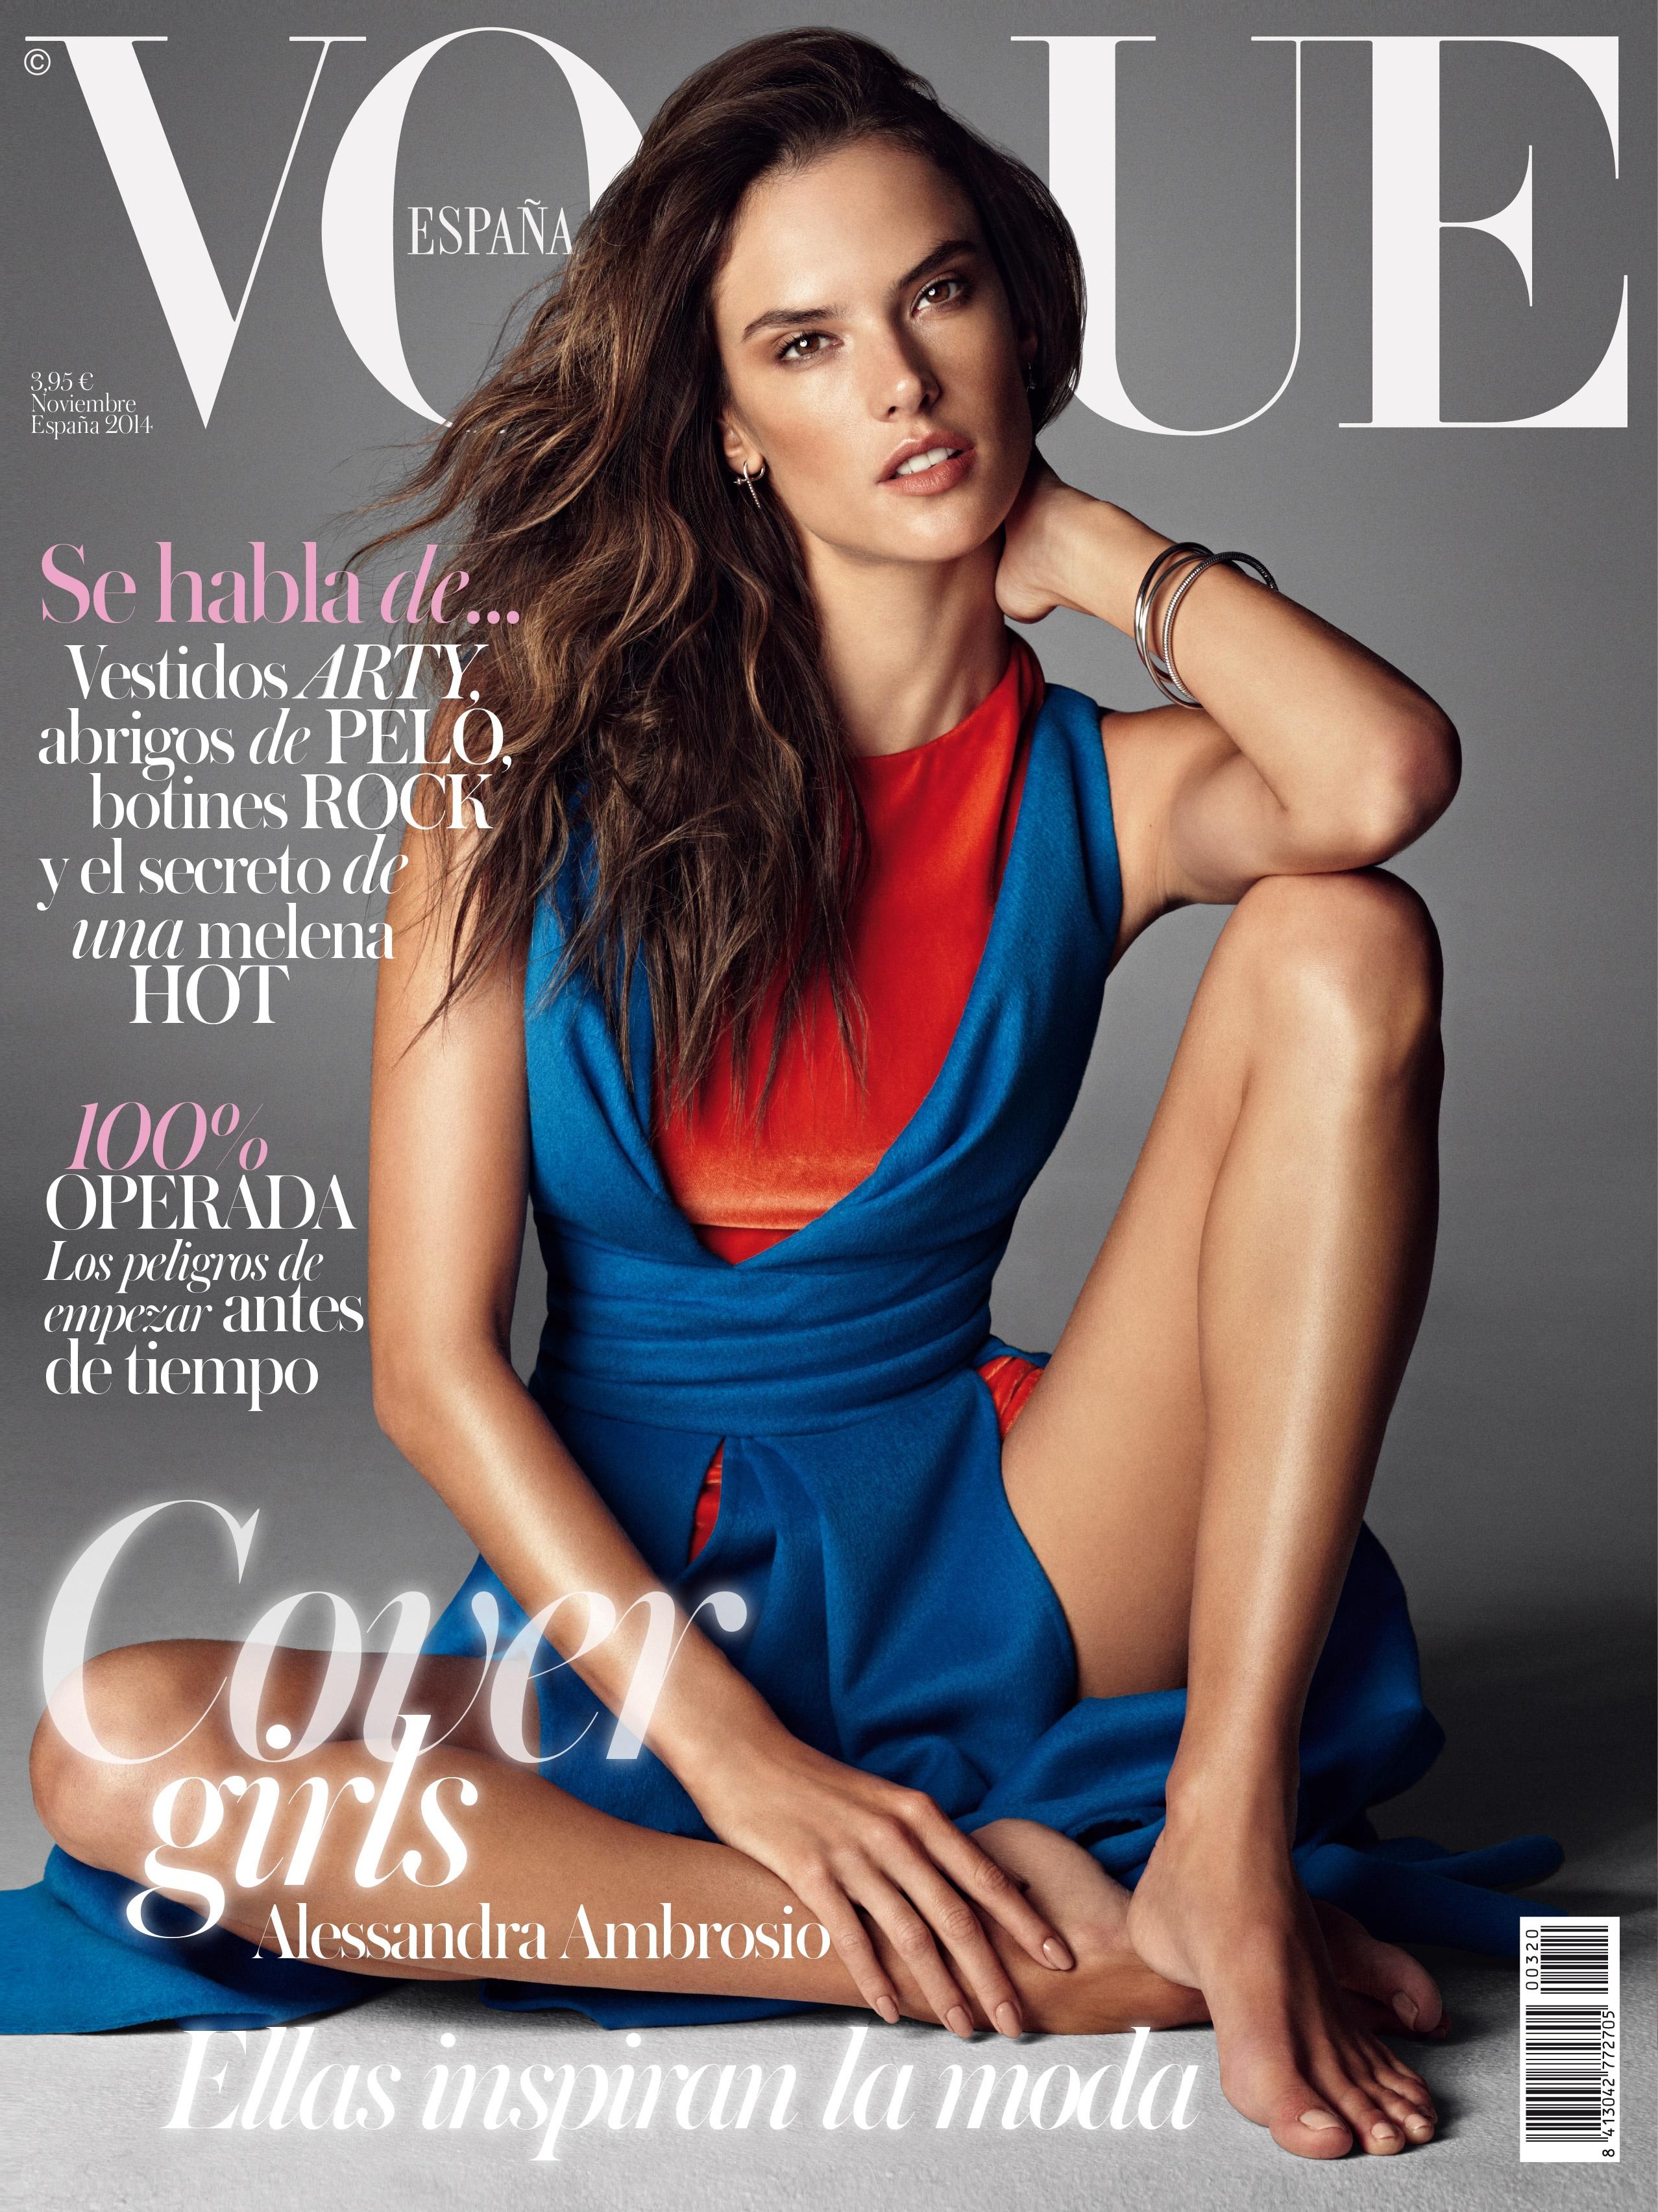 Alessandra Ambrosio - Vogue Spain Magazine Cover (November 2014)